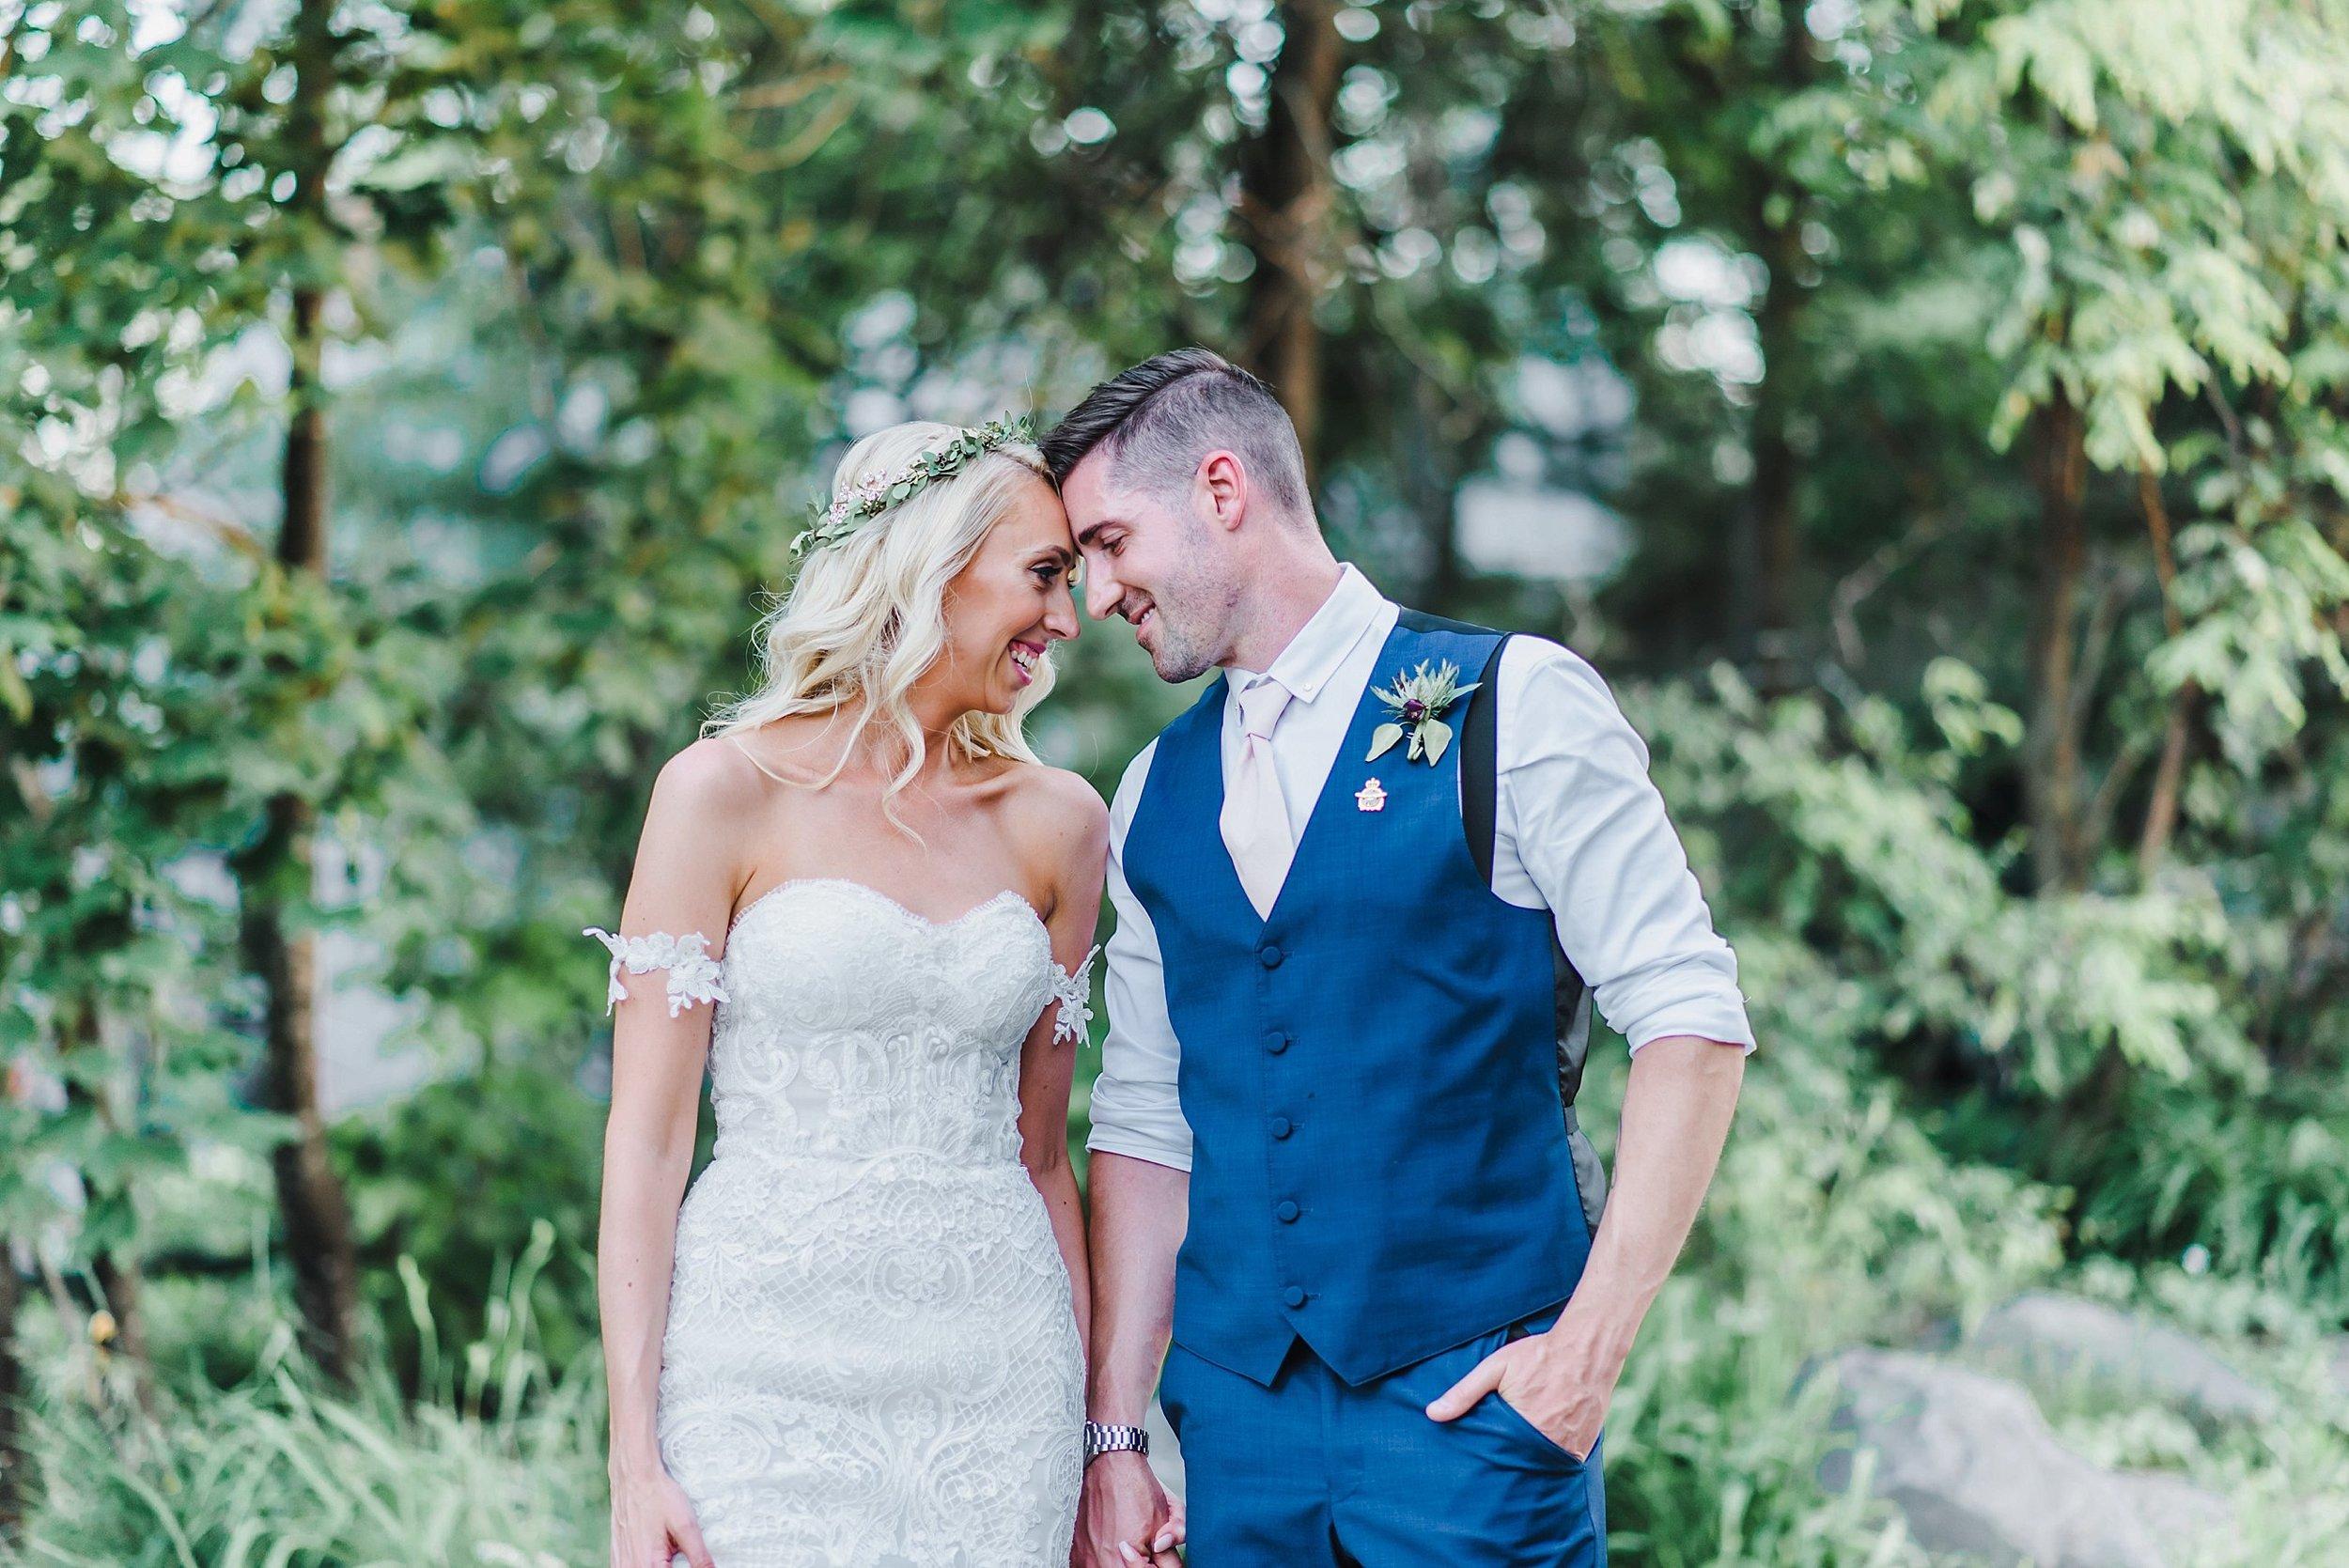 light airy indie fine art ottawa wedding photographer | Ali and Batoul Photography_0110.jpg